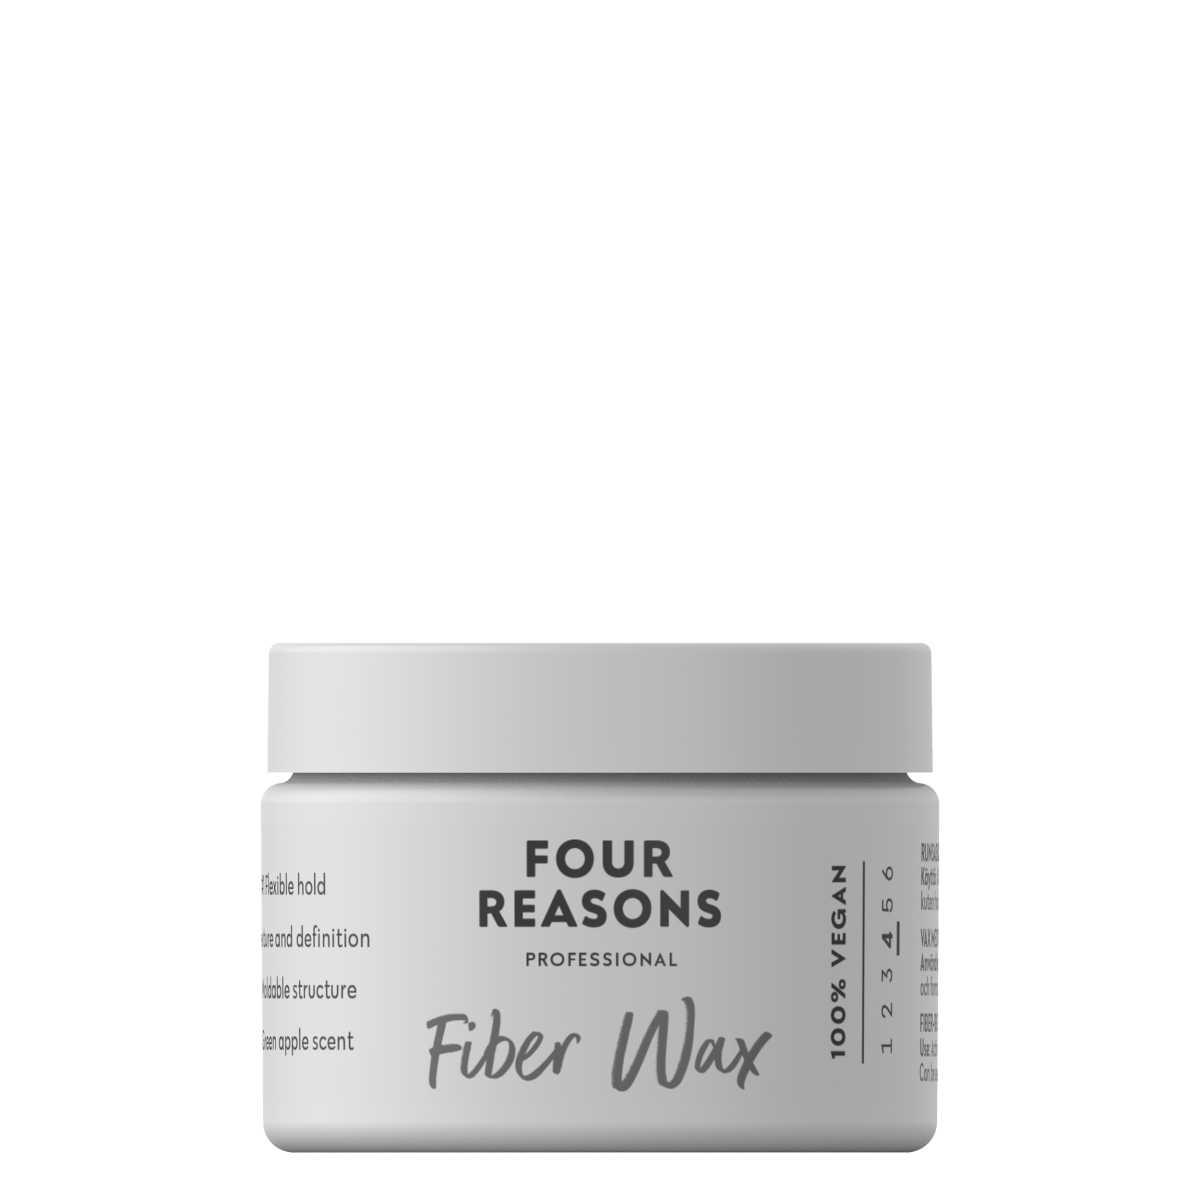 Four-Reasons-Professional-Fiber-Wax 48ae0eebea